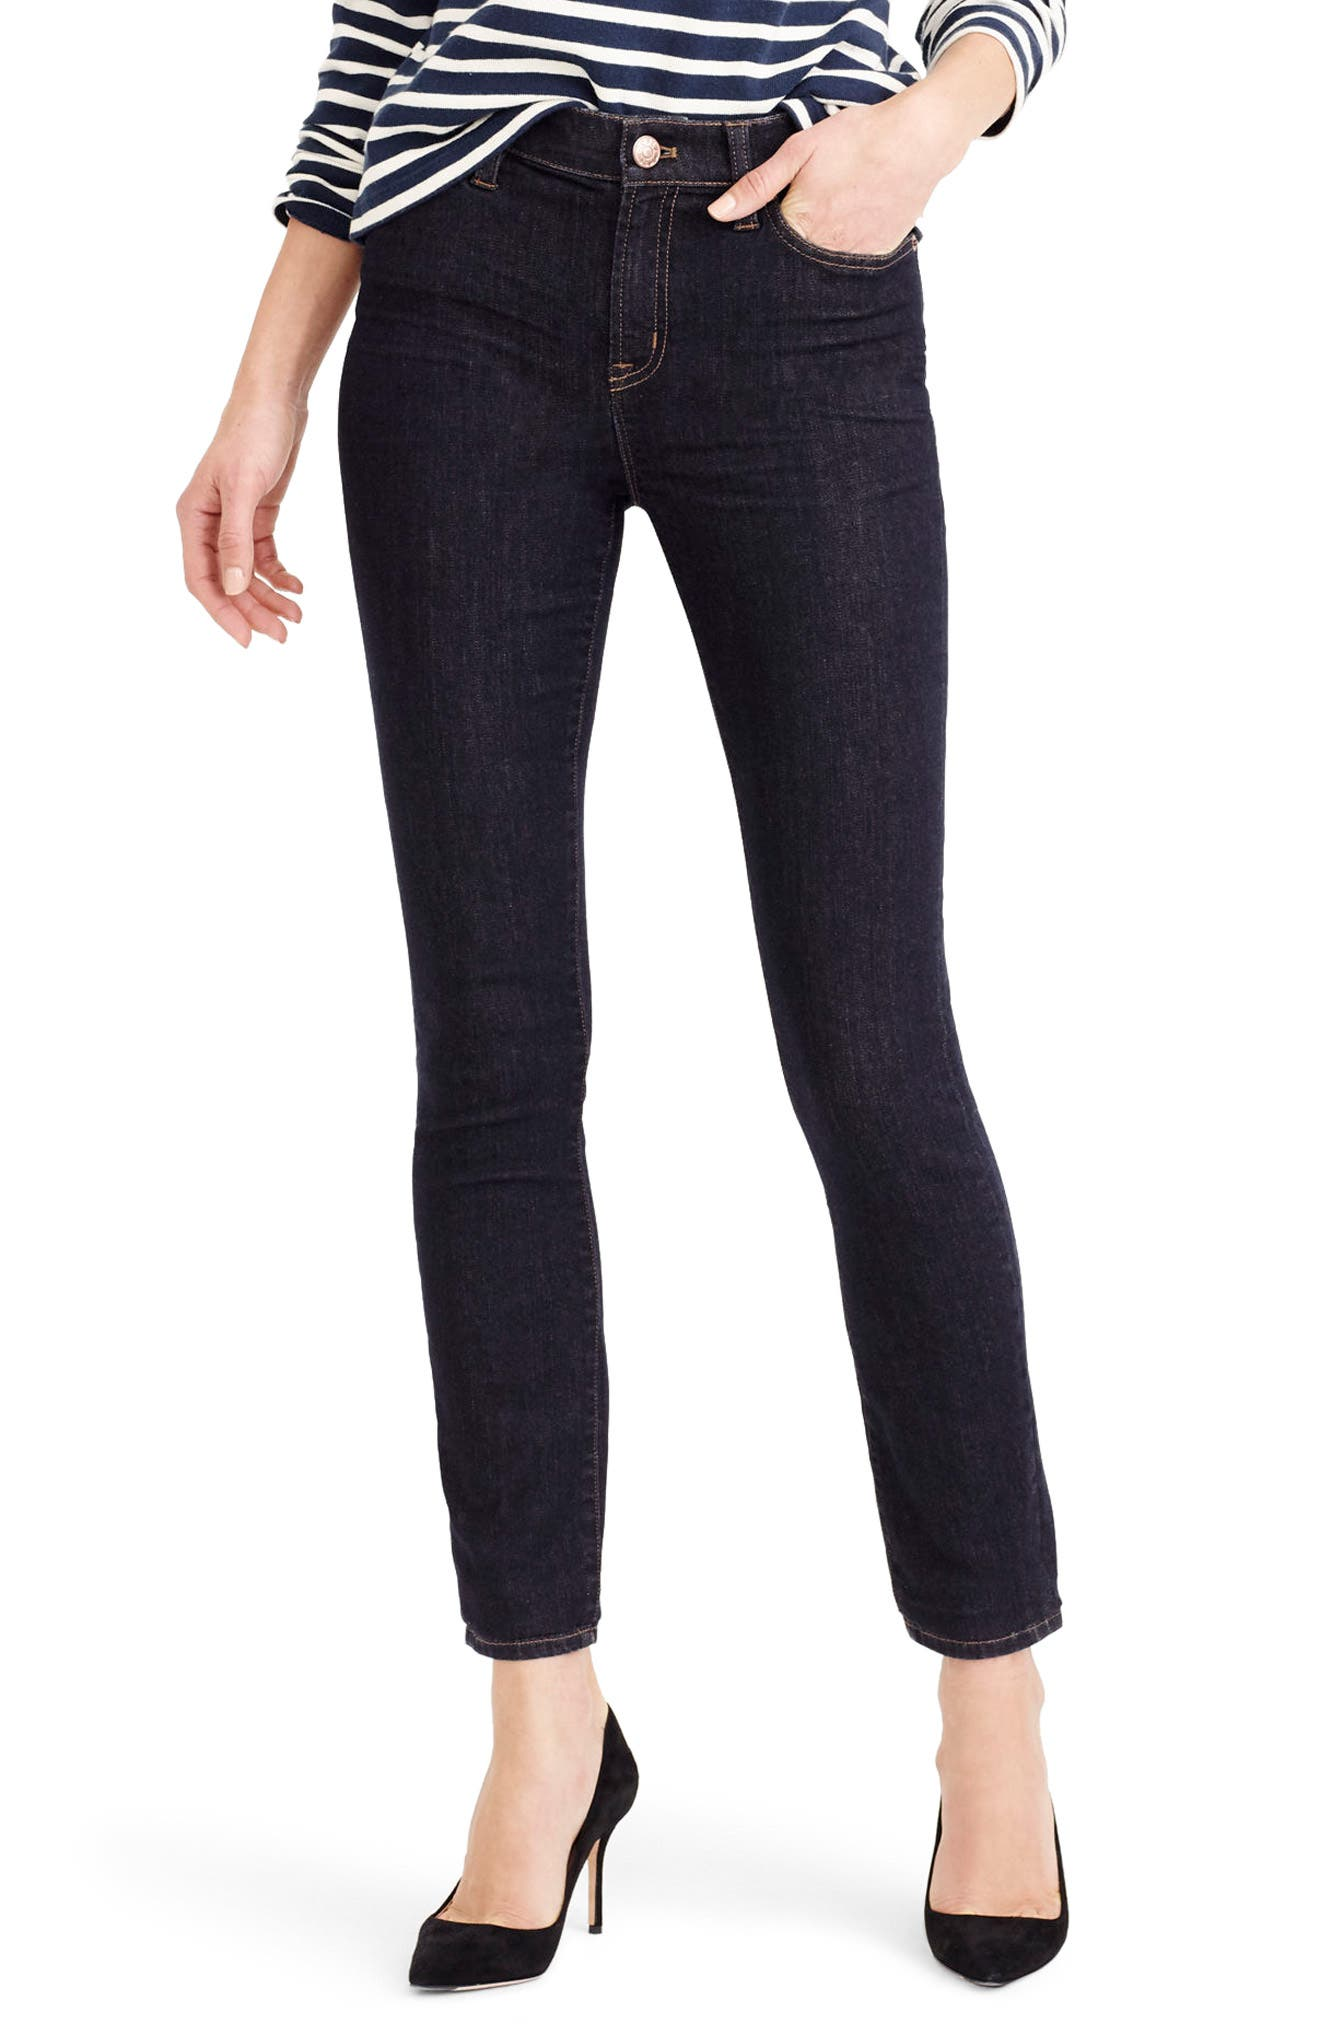 Lookout High Rise Jeans,                             Main thumbnail 1, color,                             400